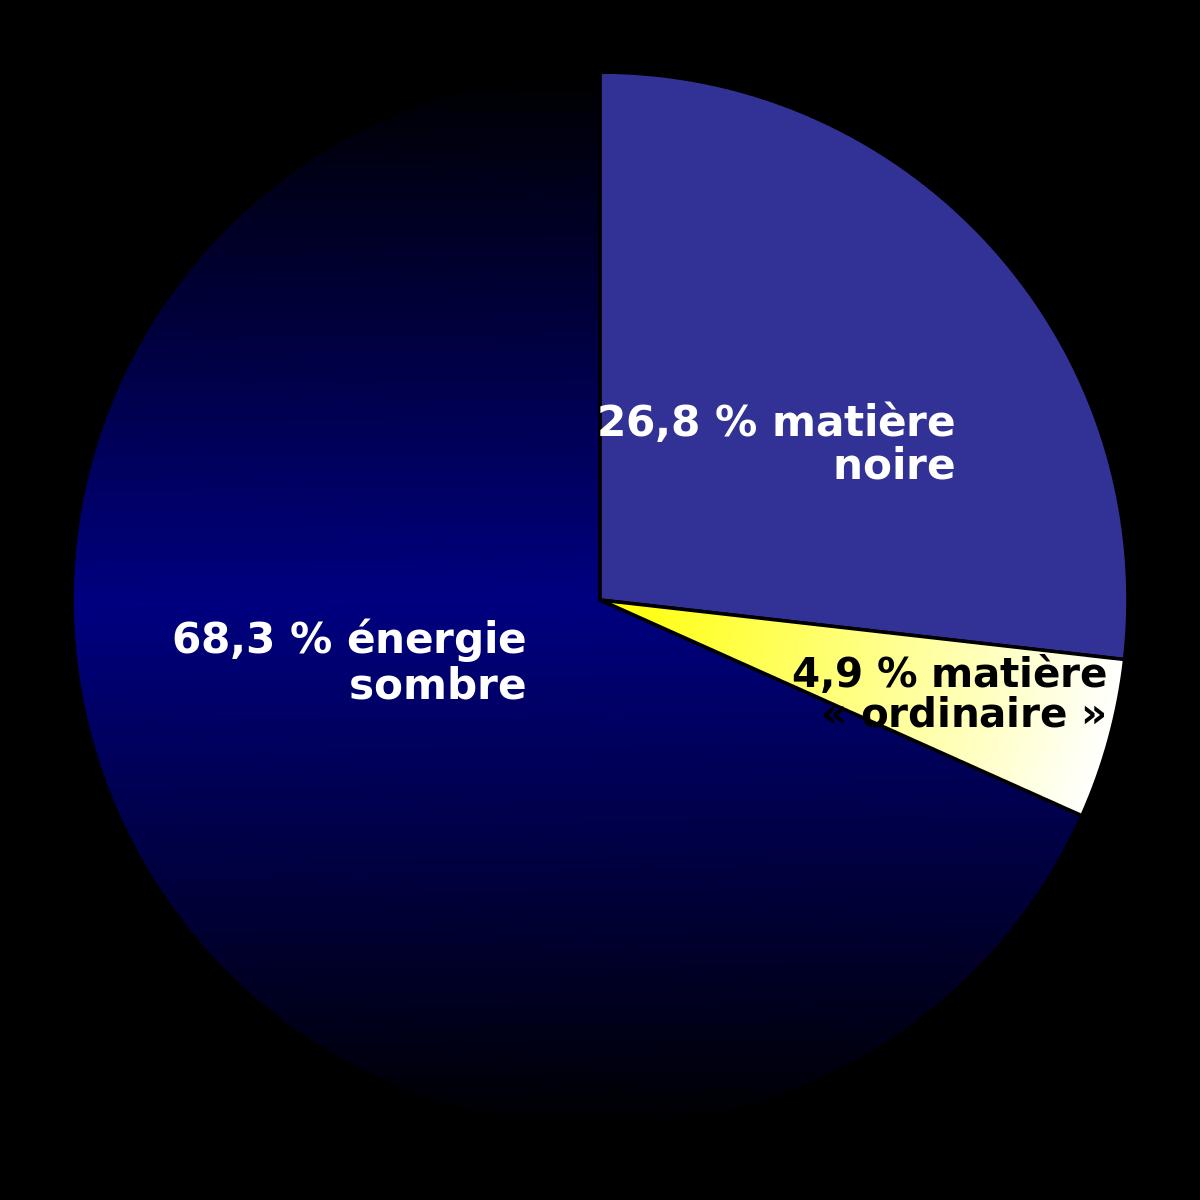 energie sombre